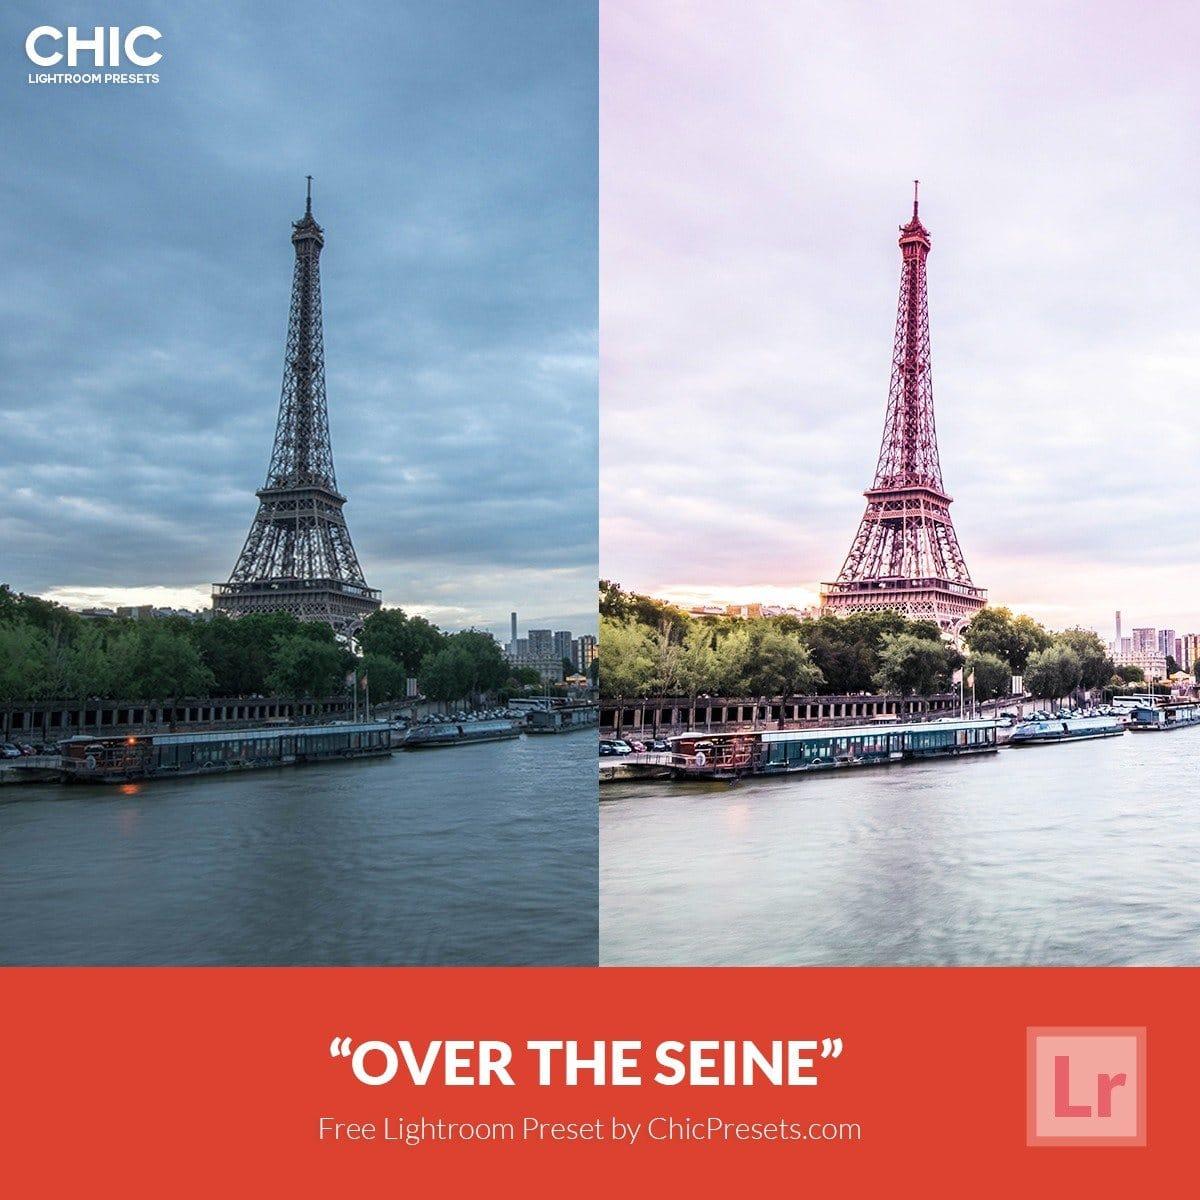 Free-Lightroom-Preset-Over-the-Seine